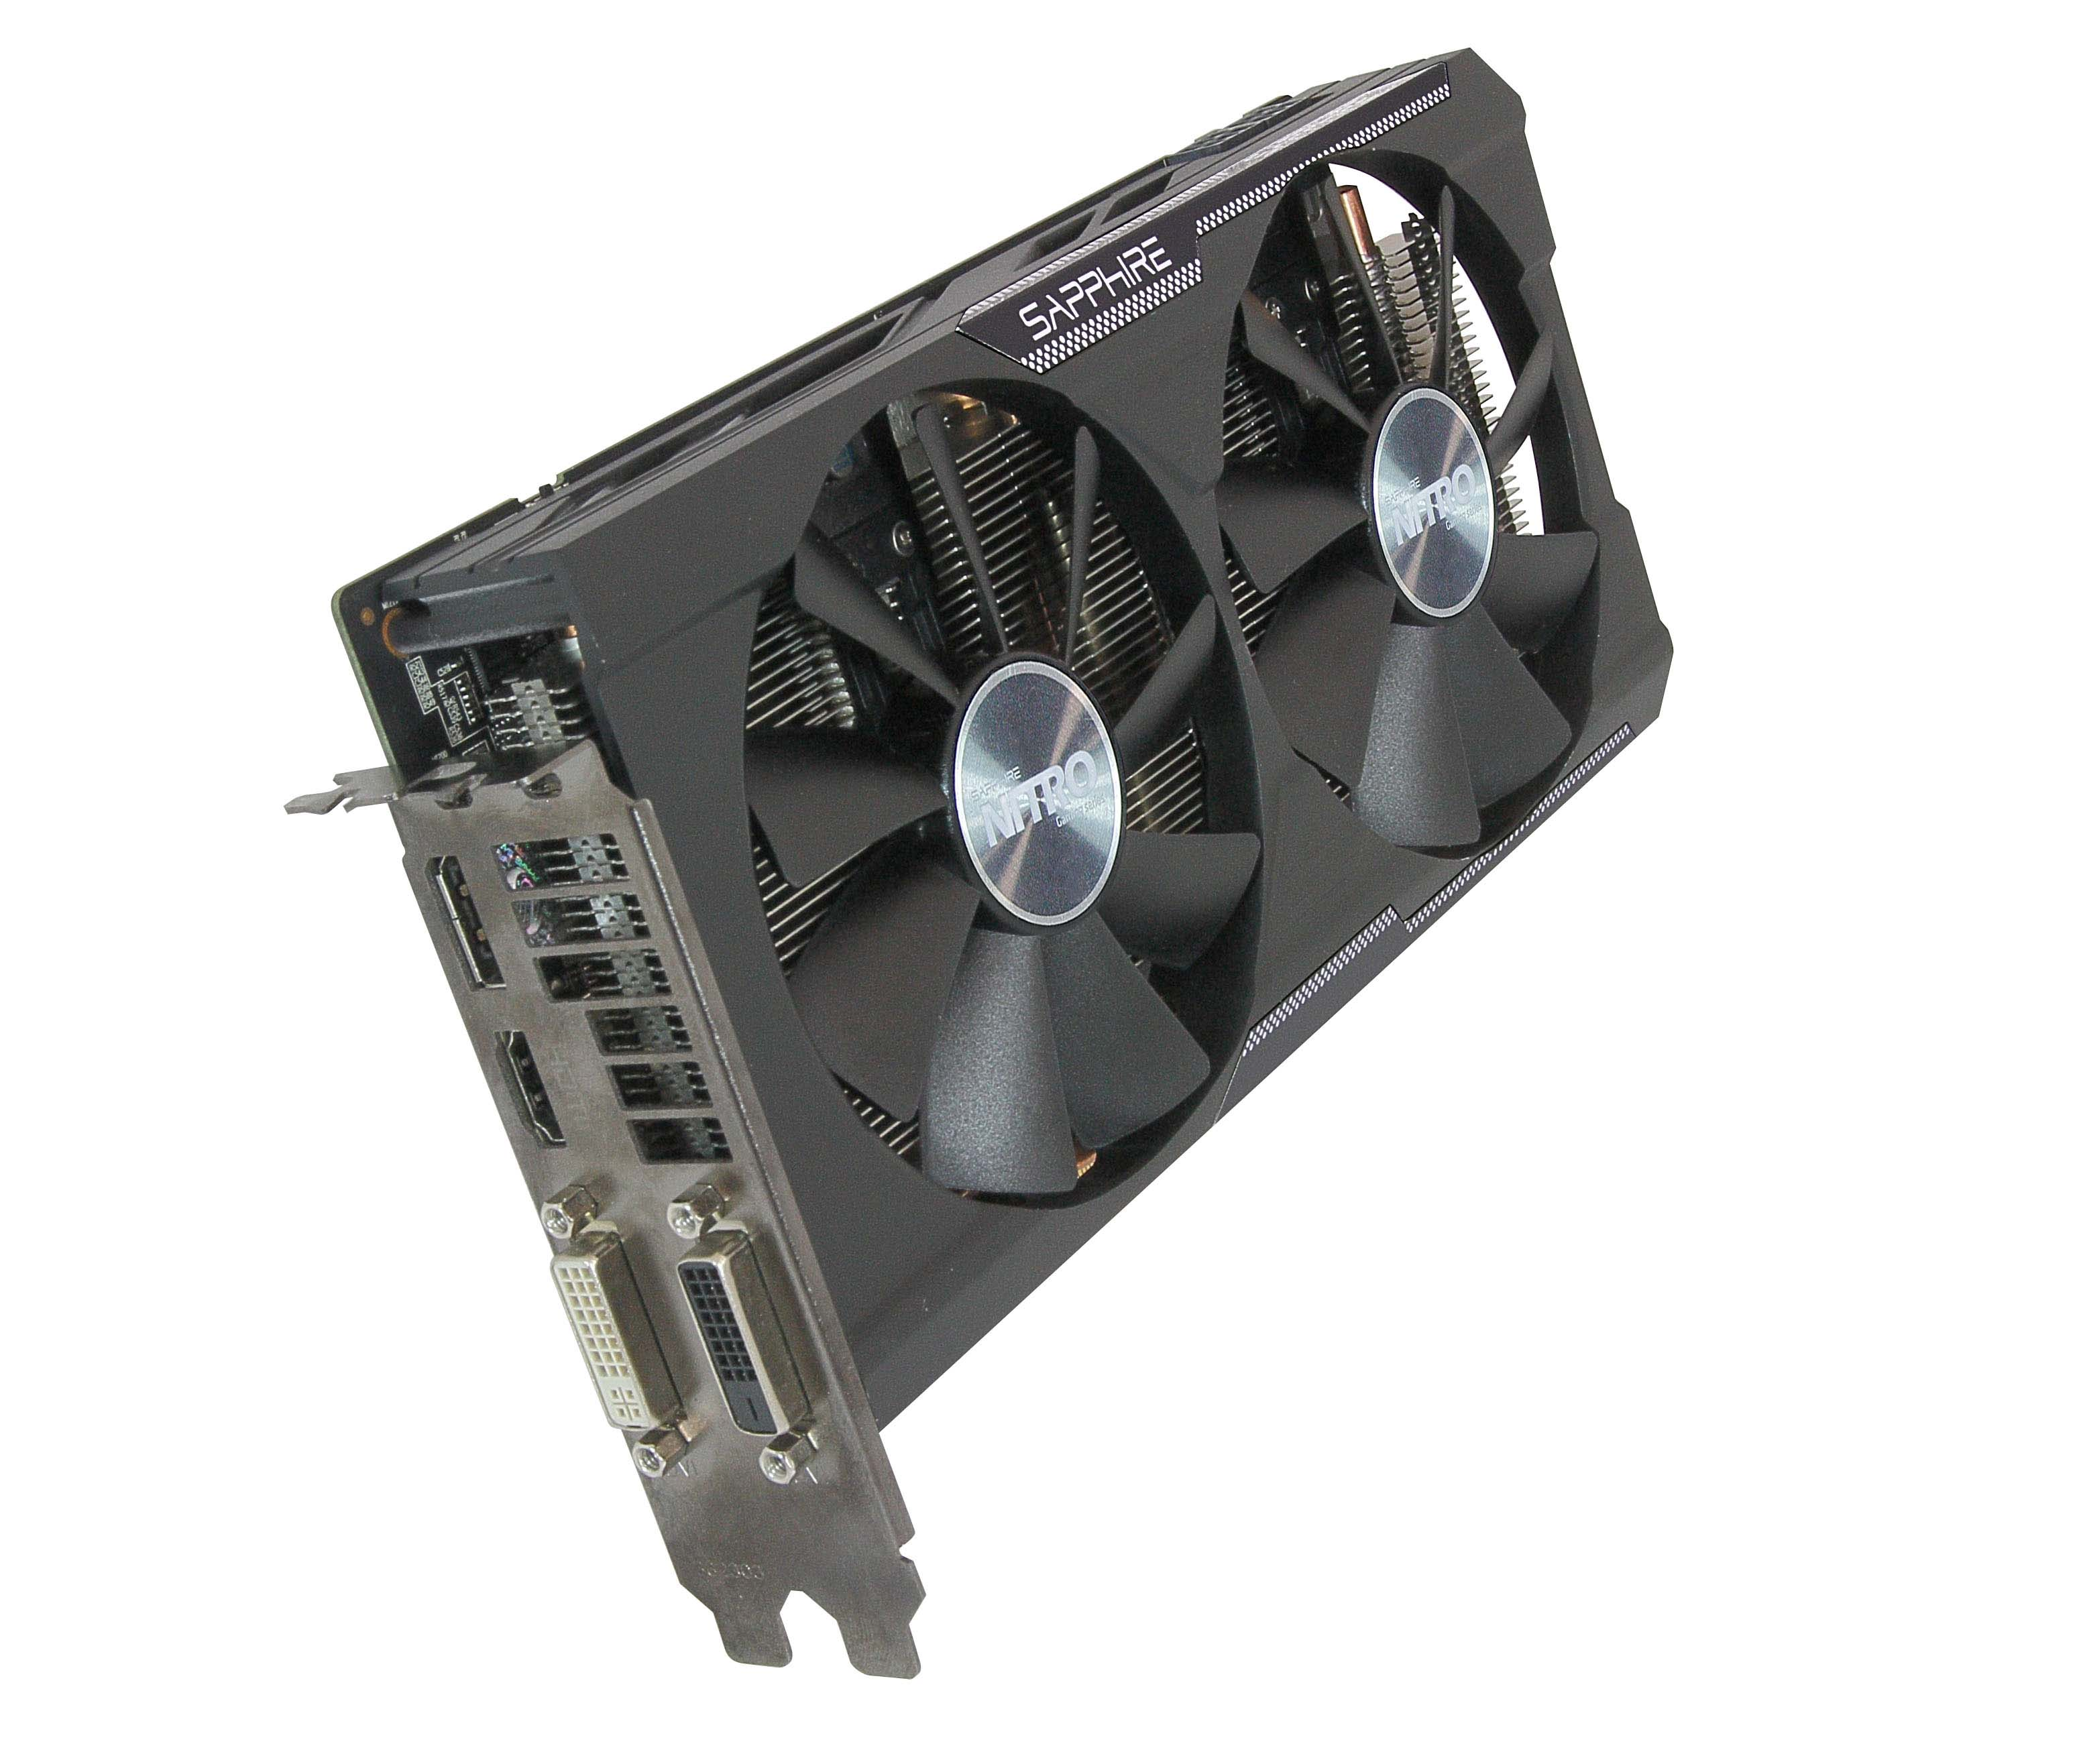 Radeon R7 360, R7 370, & R9 380 - AMD Launches Retail Radeon